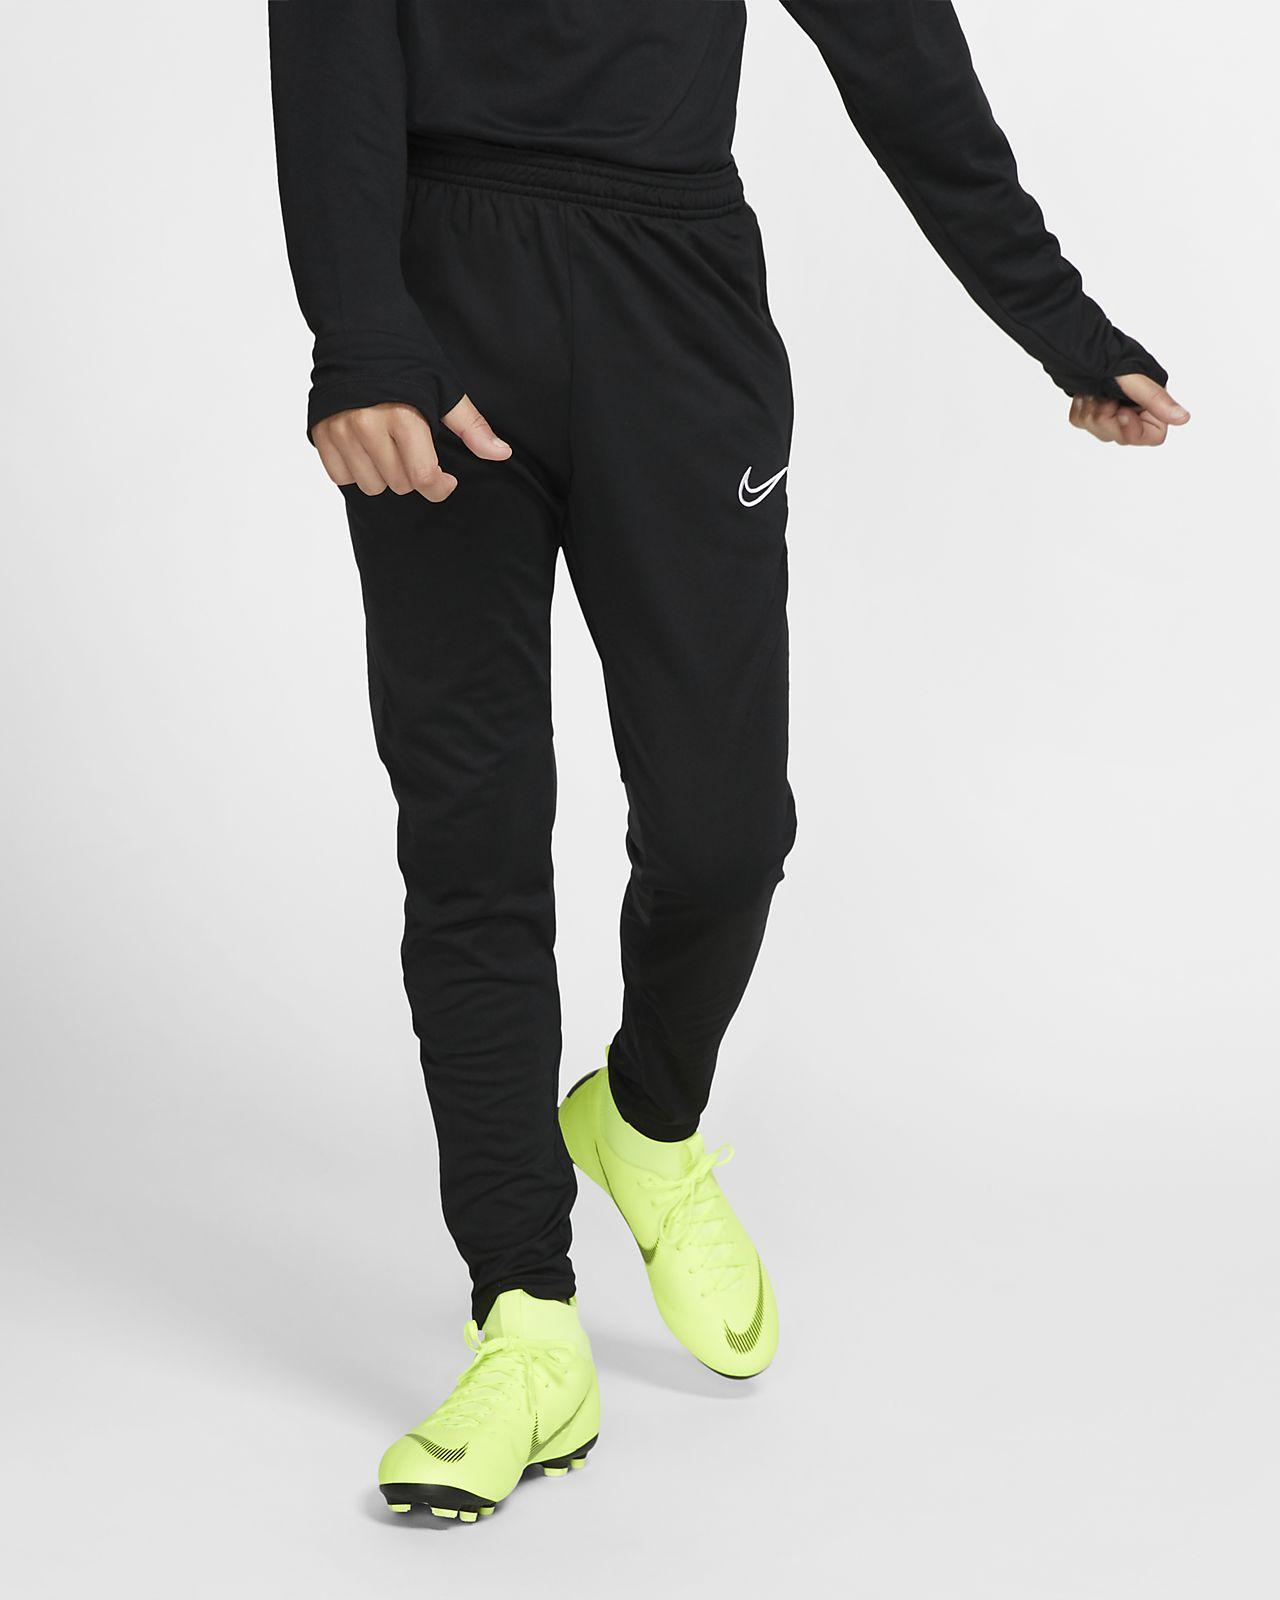 Nike Dri-FIT Academy Fußballhose für ältere Kinder